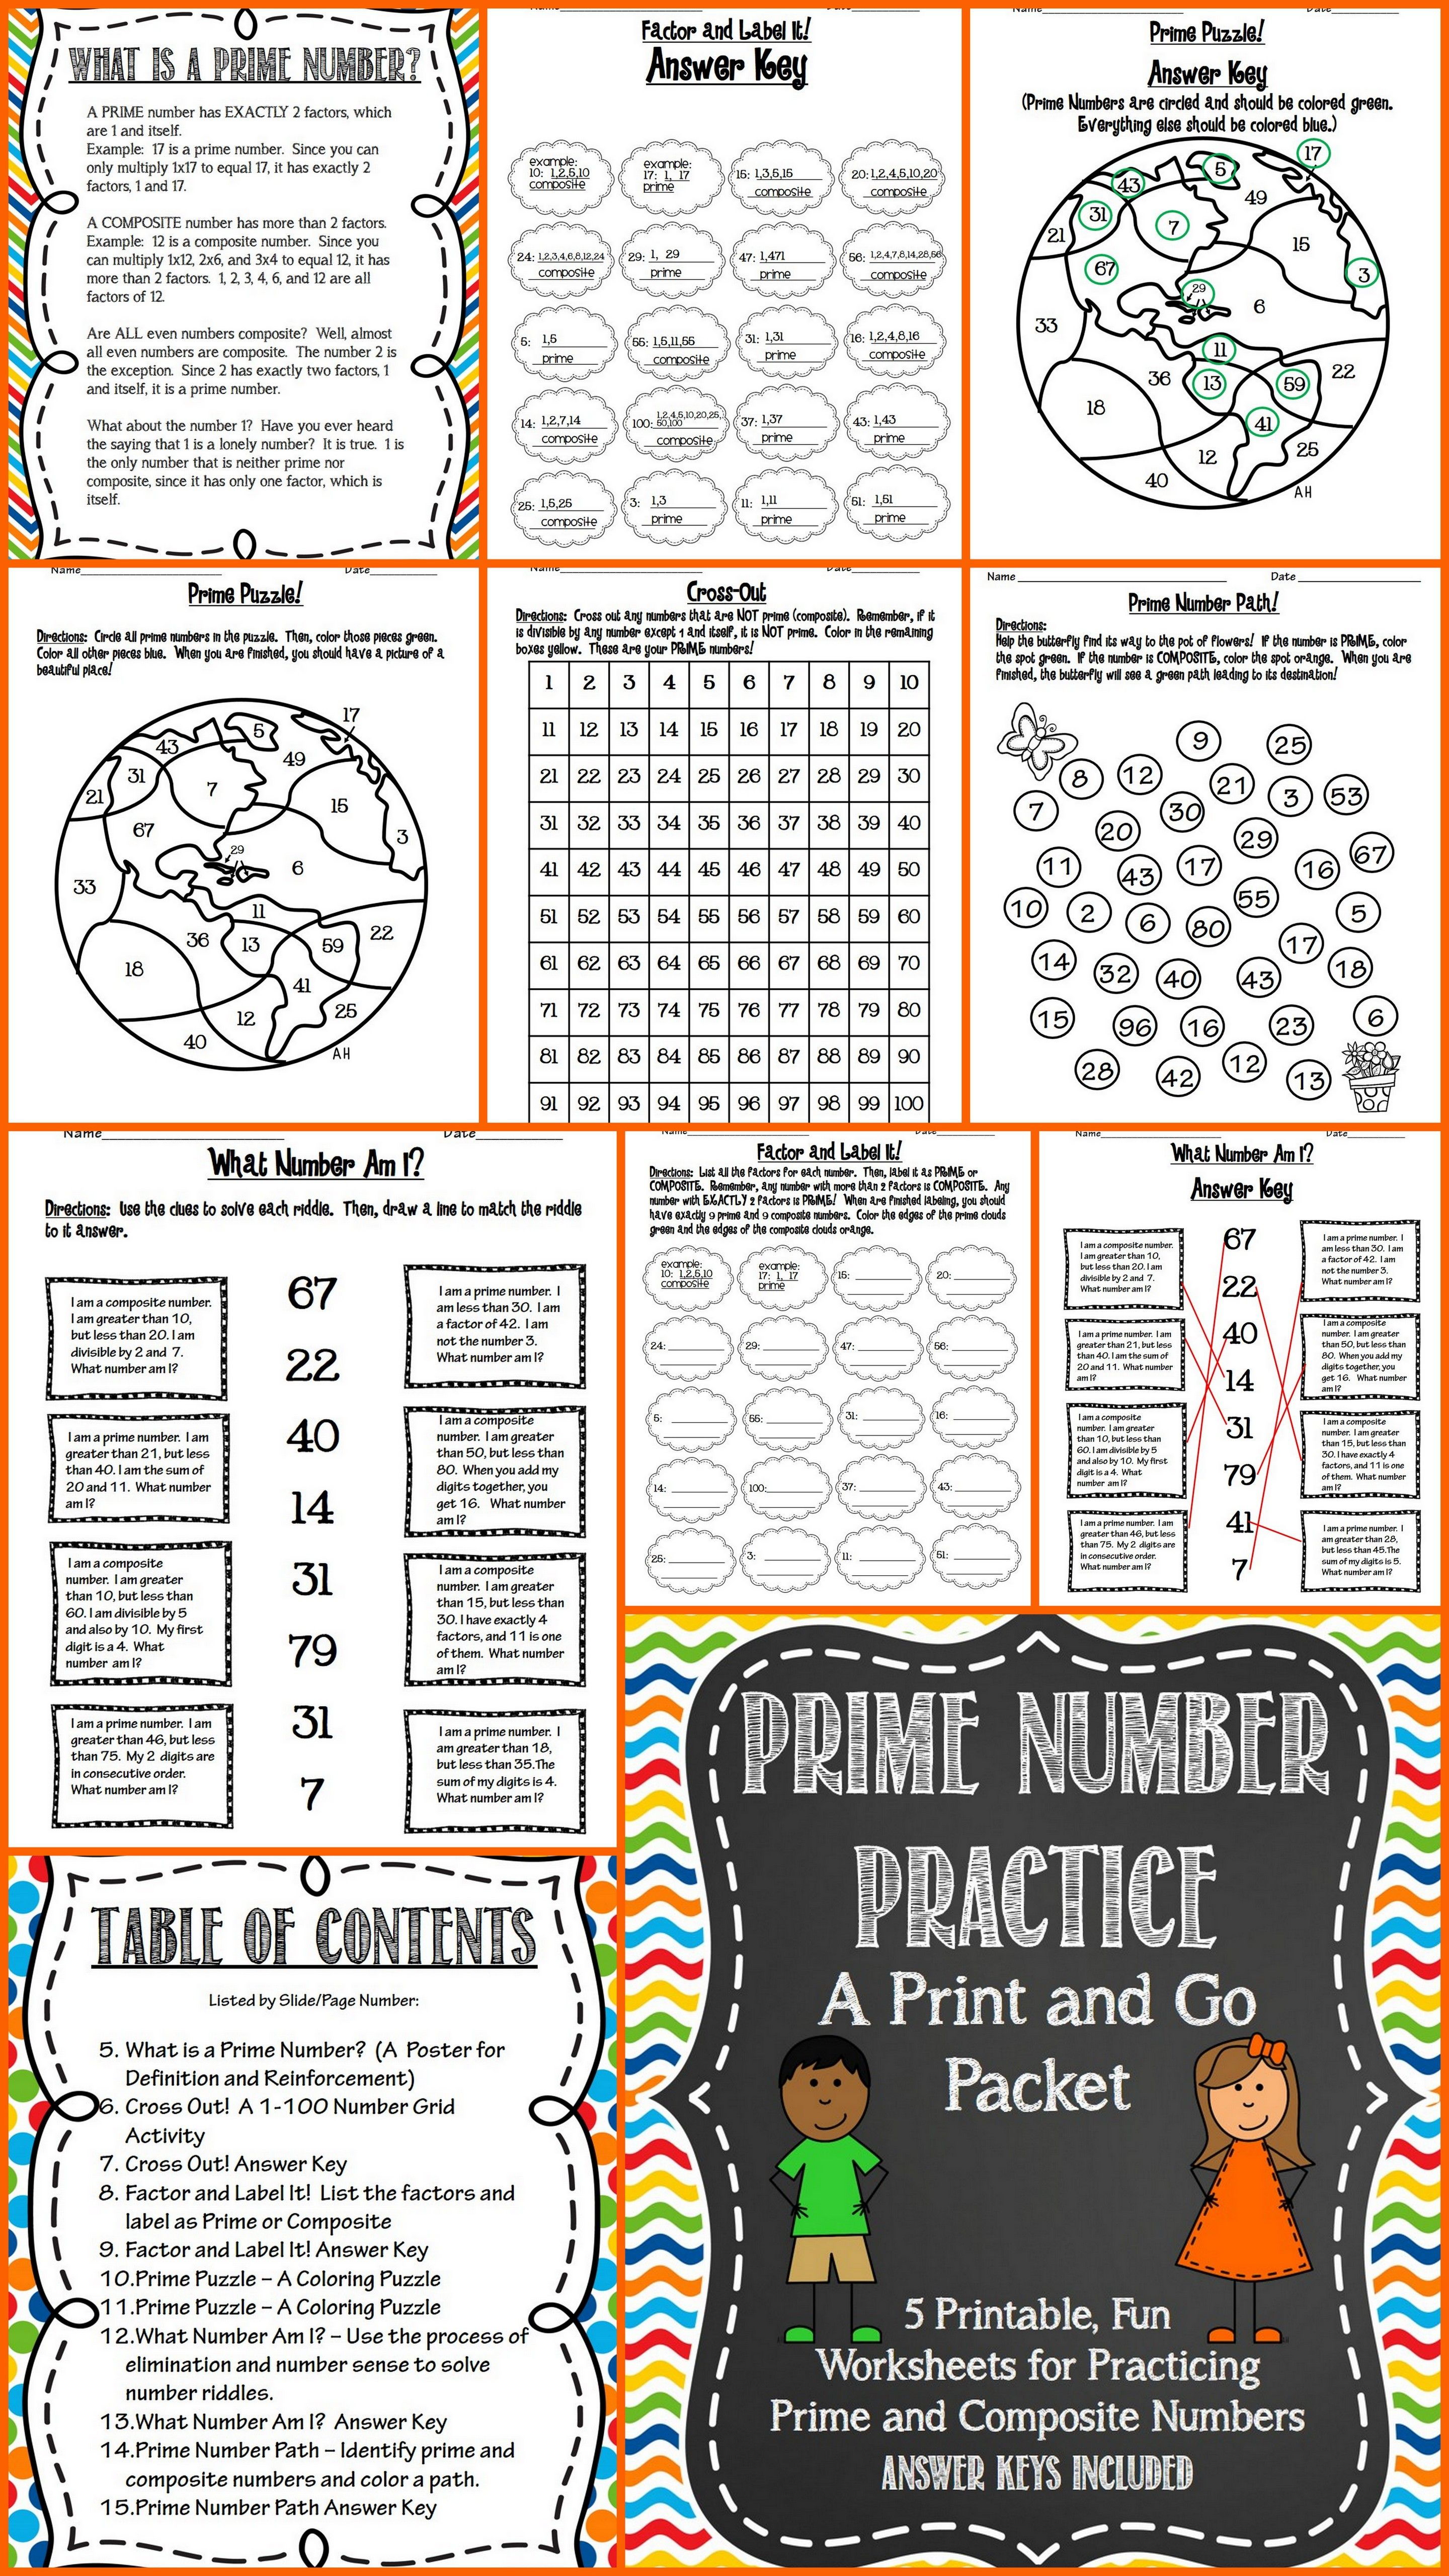 Prime Number Practice